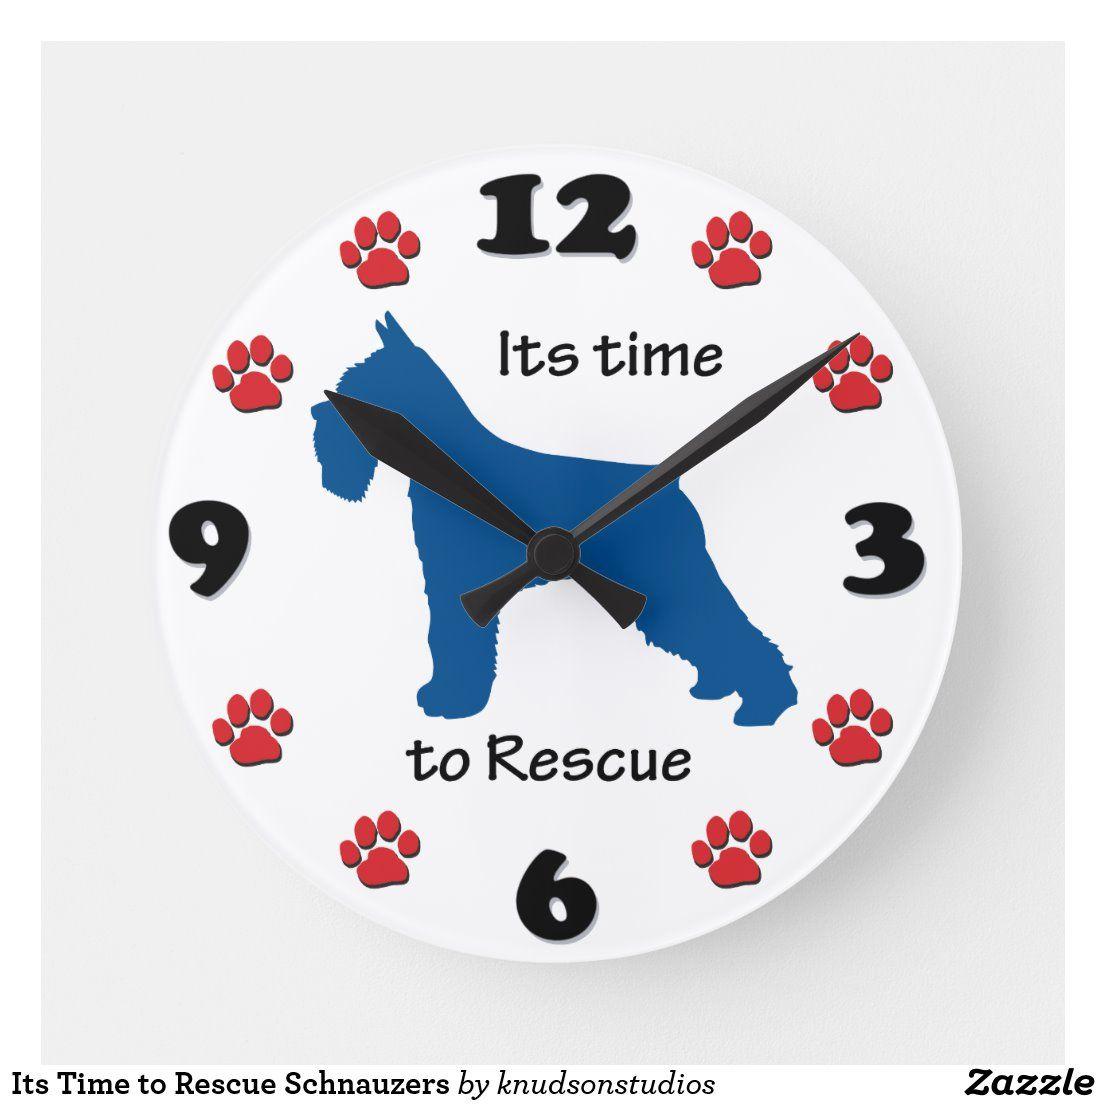 Its Time To Rescue Schnauzers Round Clock Zazzle Com In 2020 Schnauzer Rescue Clock